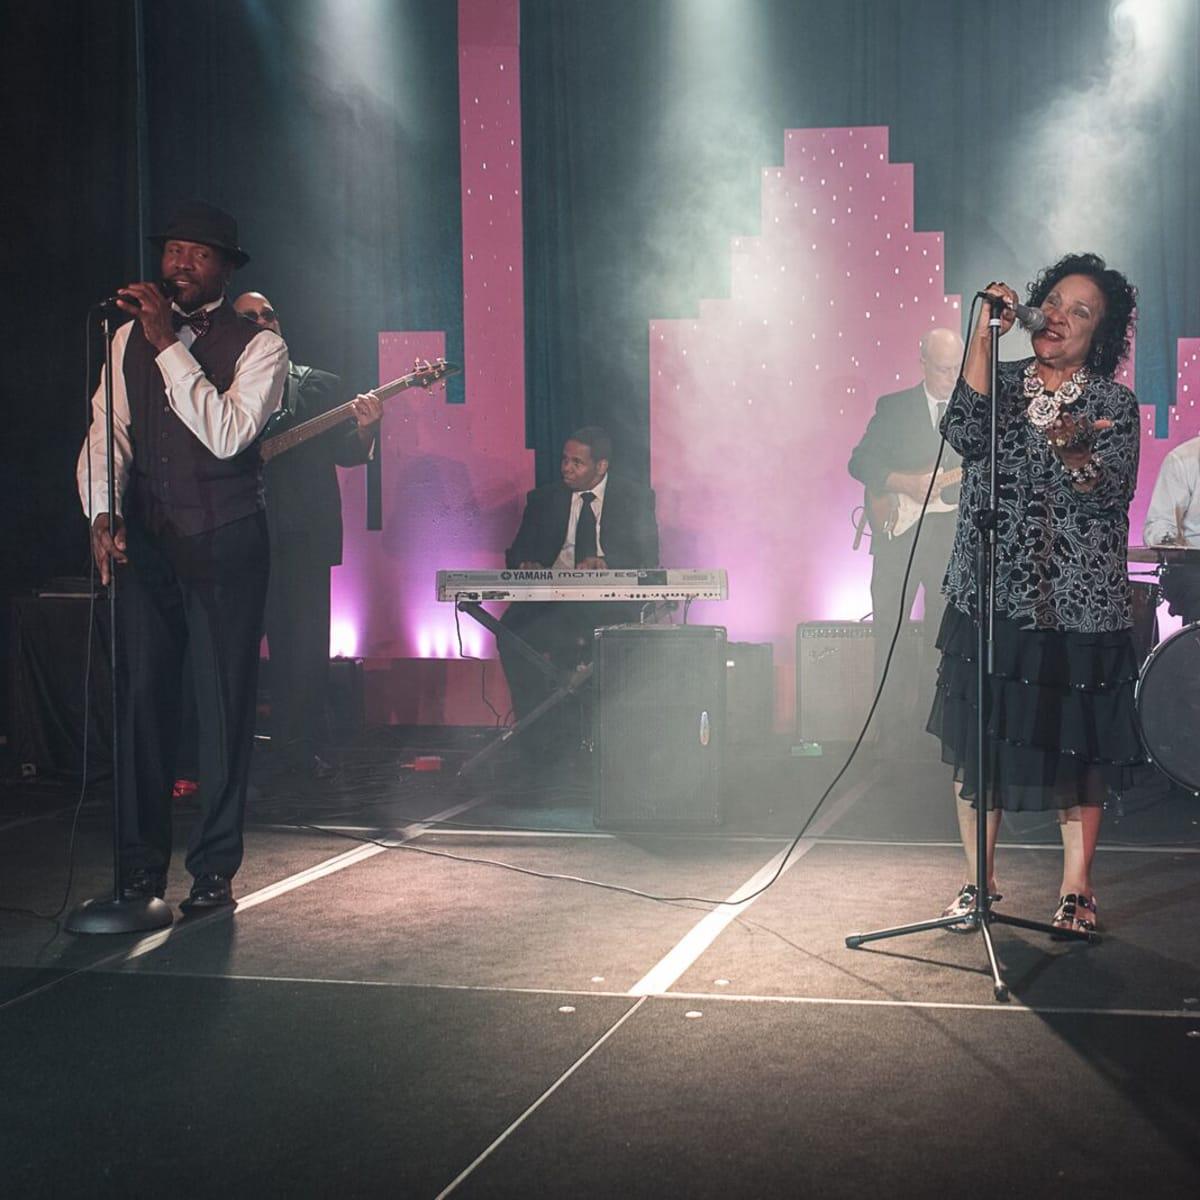 News, Shelby, Ensemble Theatre gala, Aug. 2015, Yvonne Washington